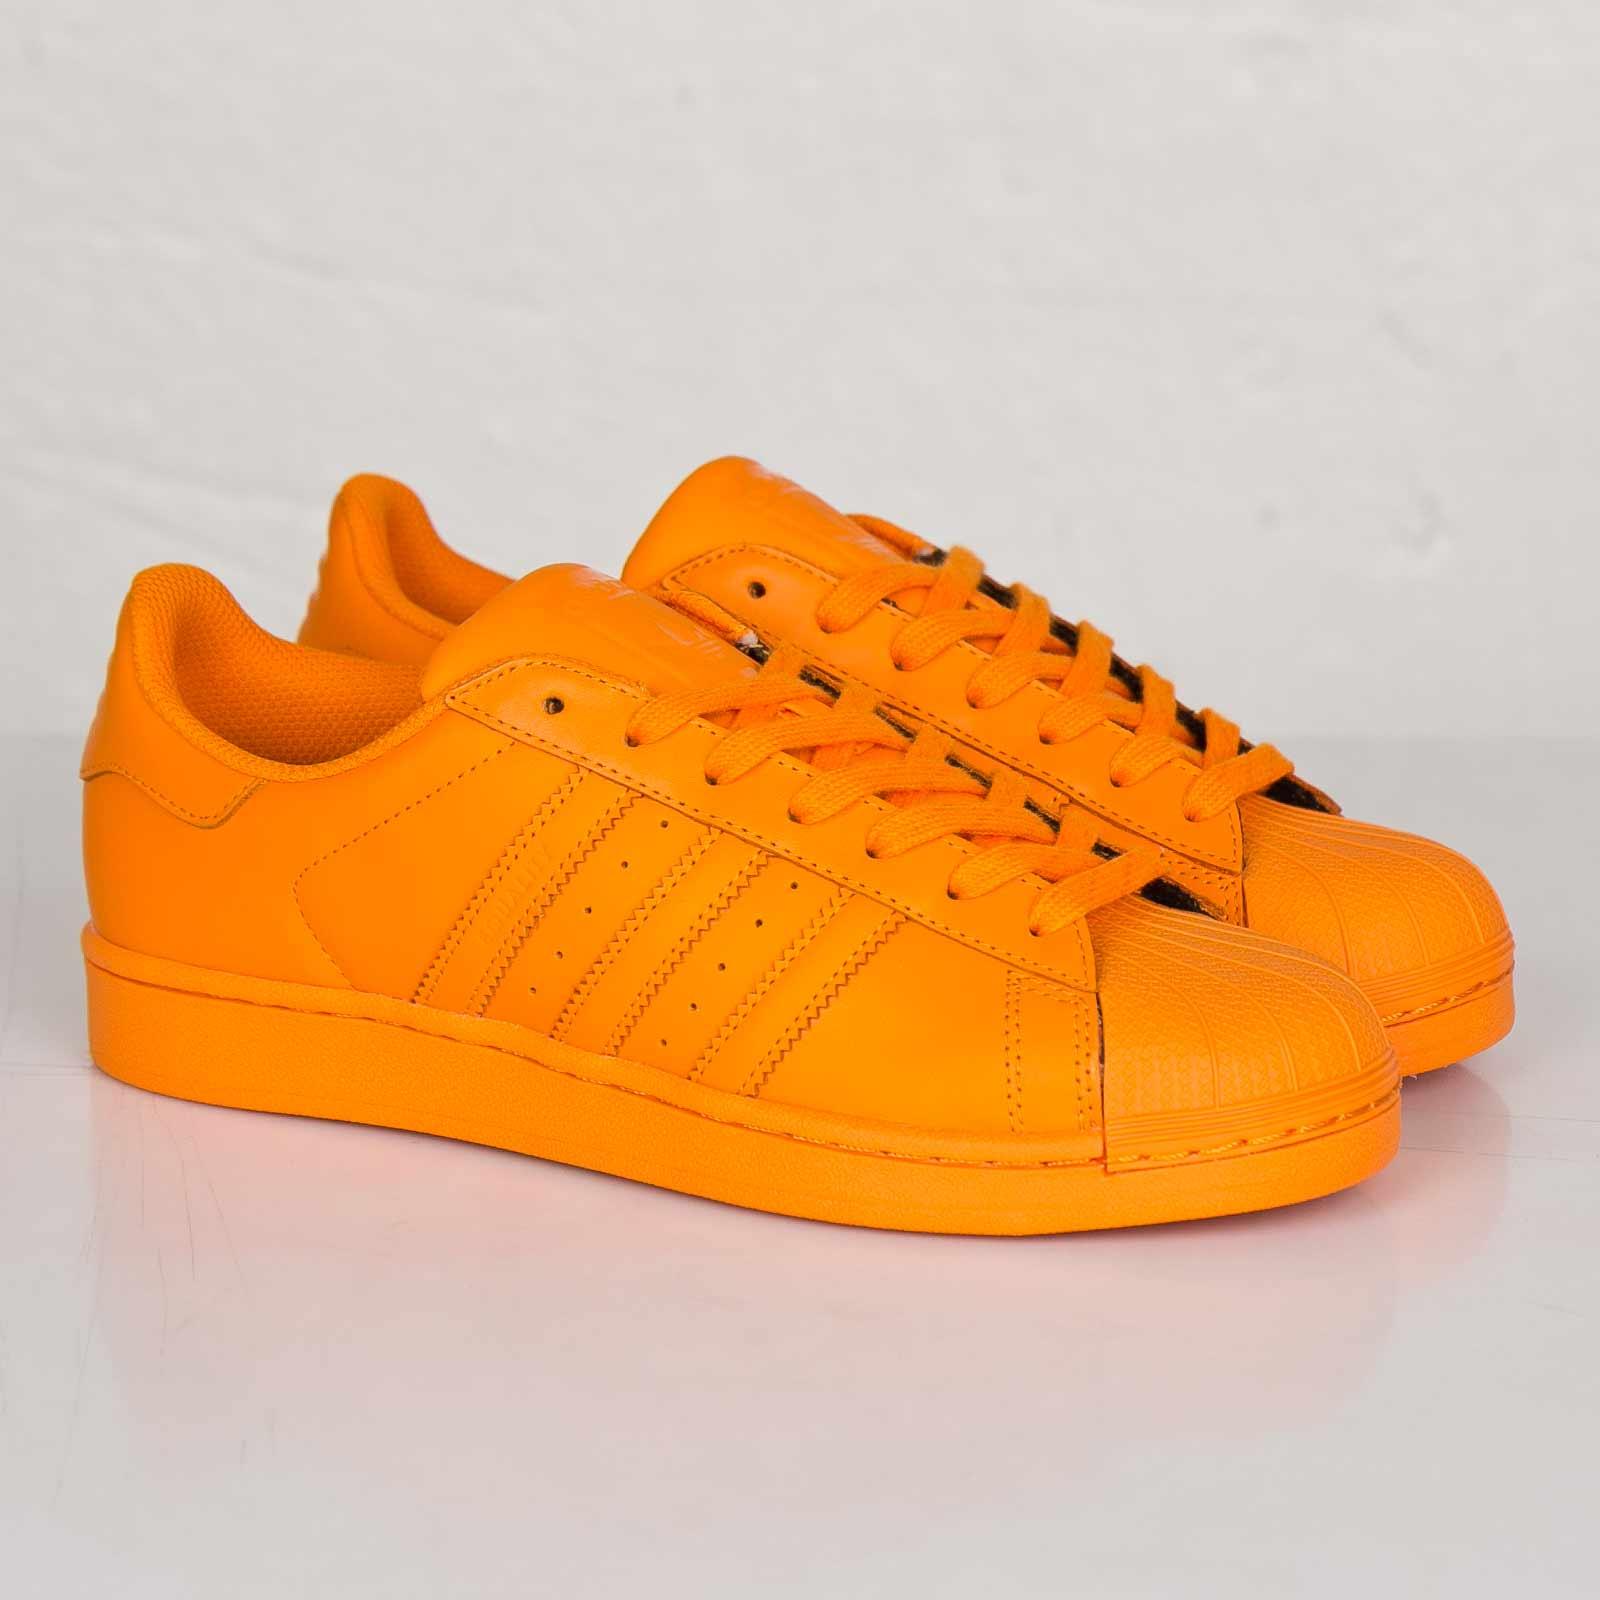 new concept 25bec c466a adidas Superstar Supercolor Pack - S83394 - Sneakersnstuff ...